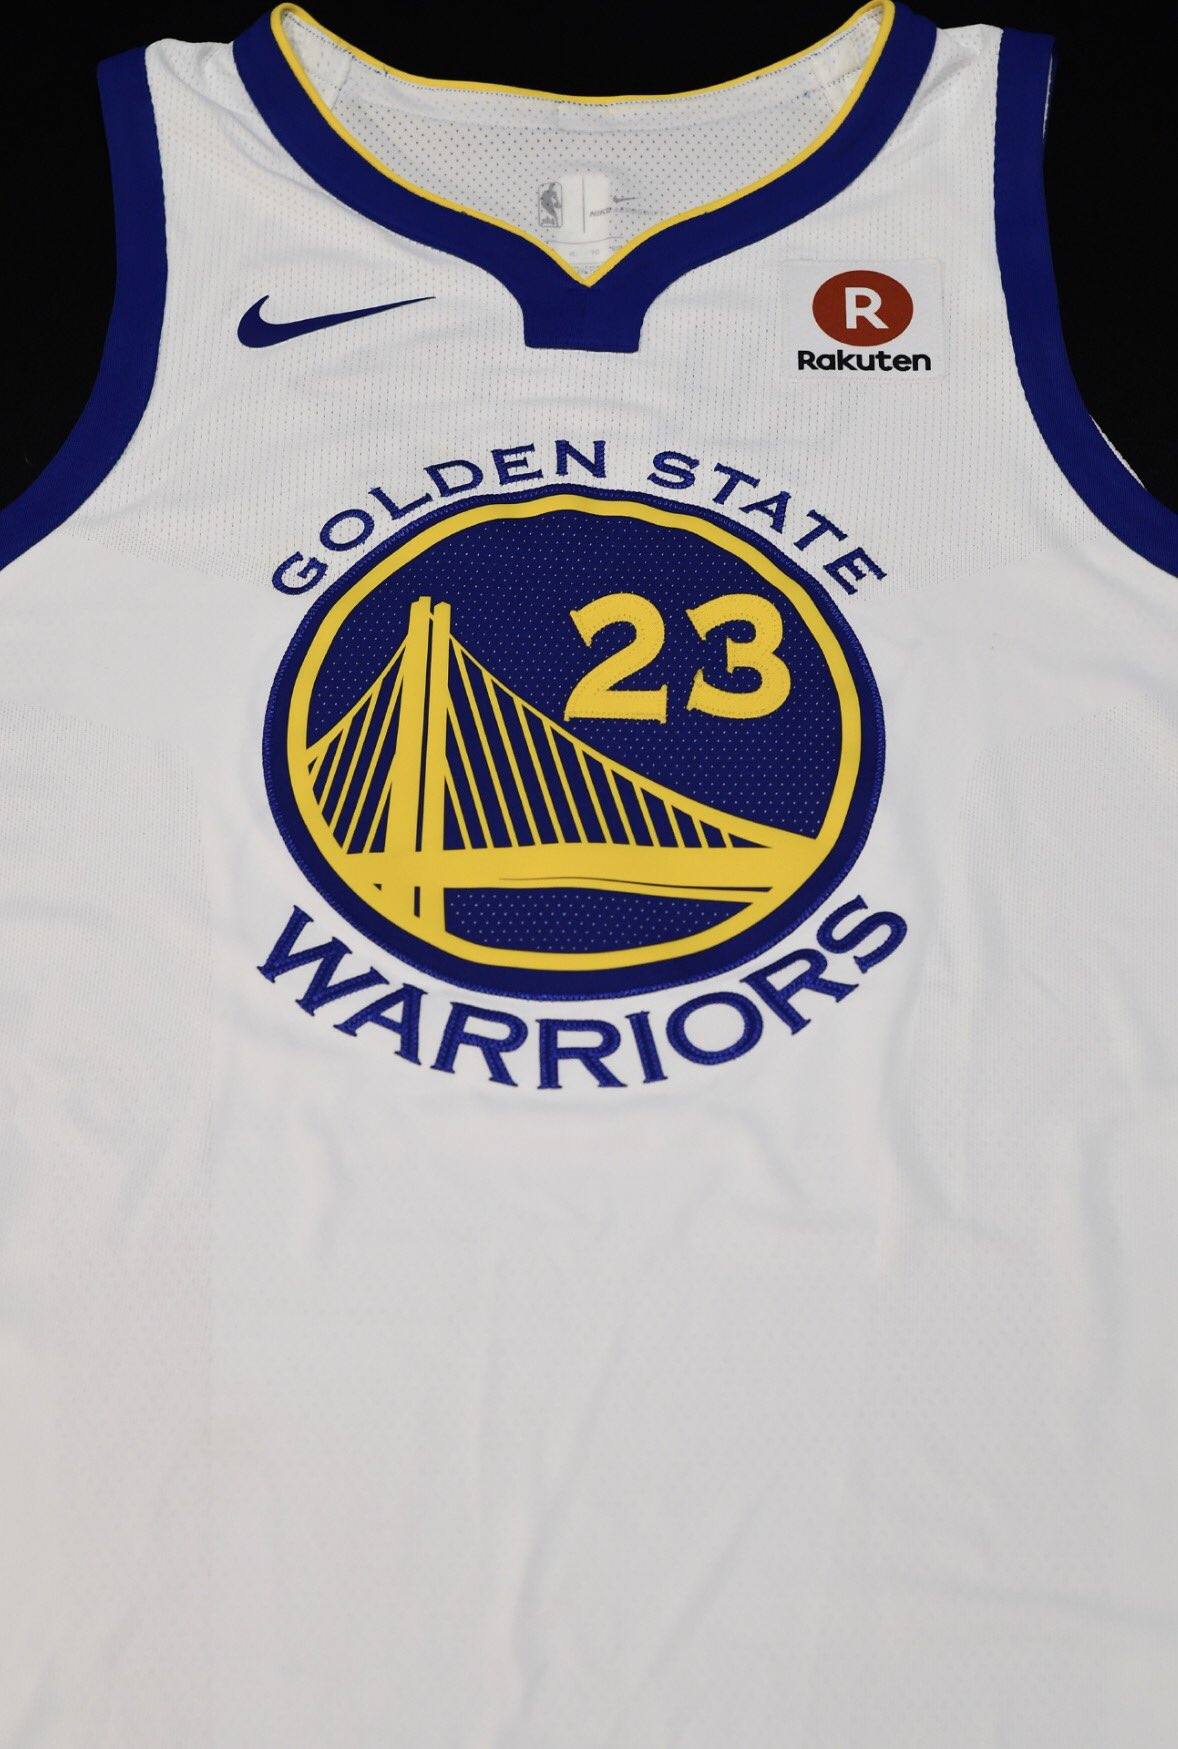 Rakuten devient le sponsor maillot des Golden State Warriors